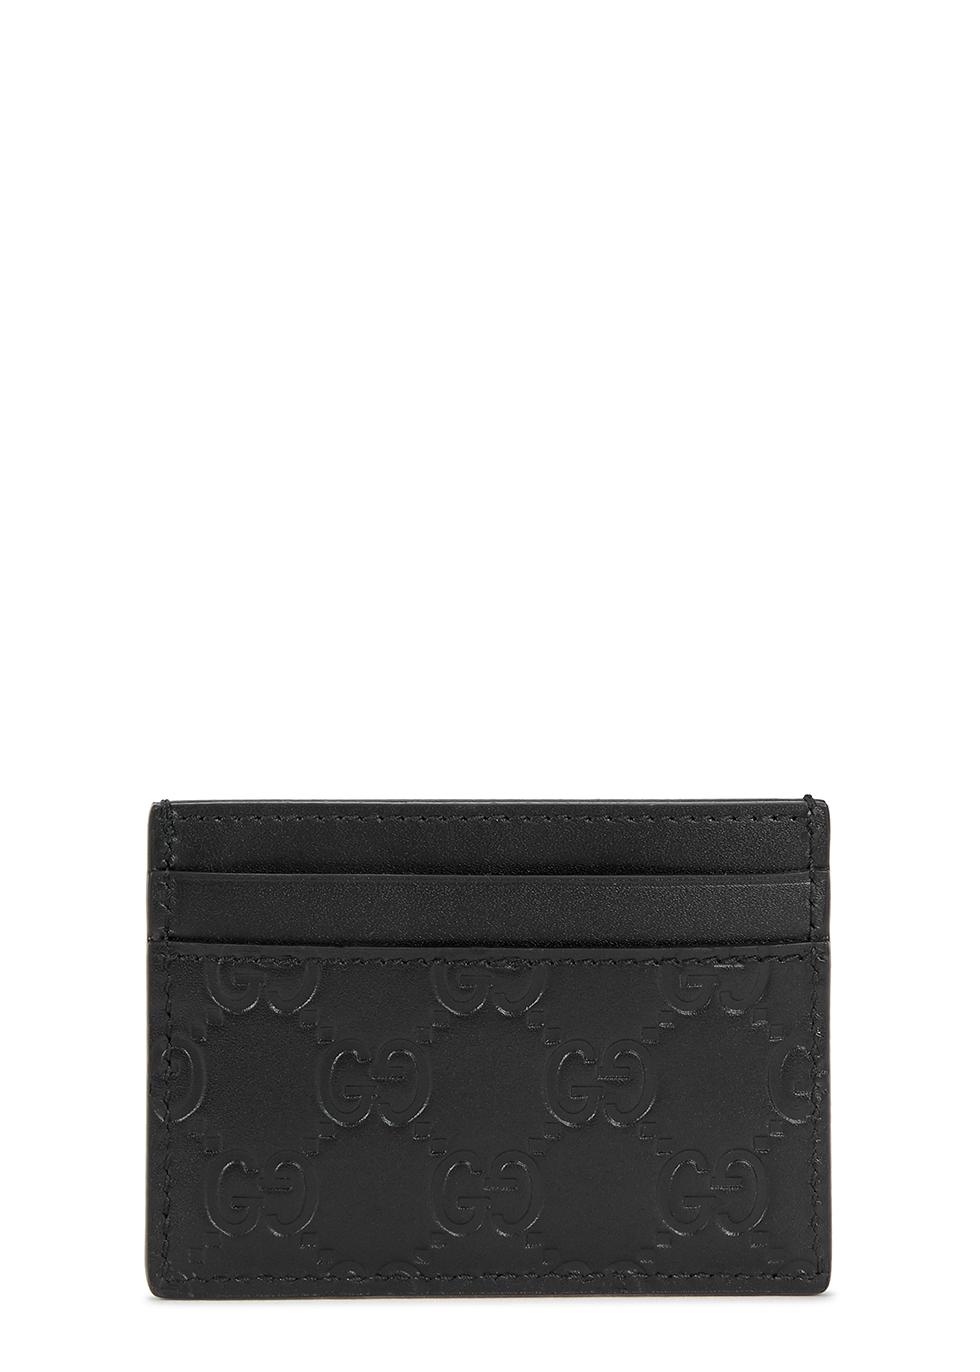 249976203d0 Men s Designer Small Leather Accessories - Harvey Nichols